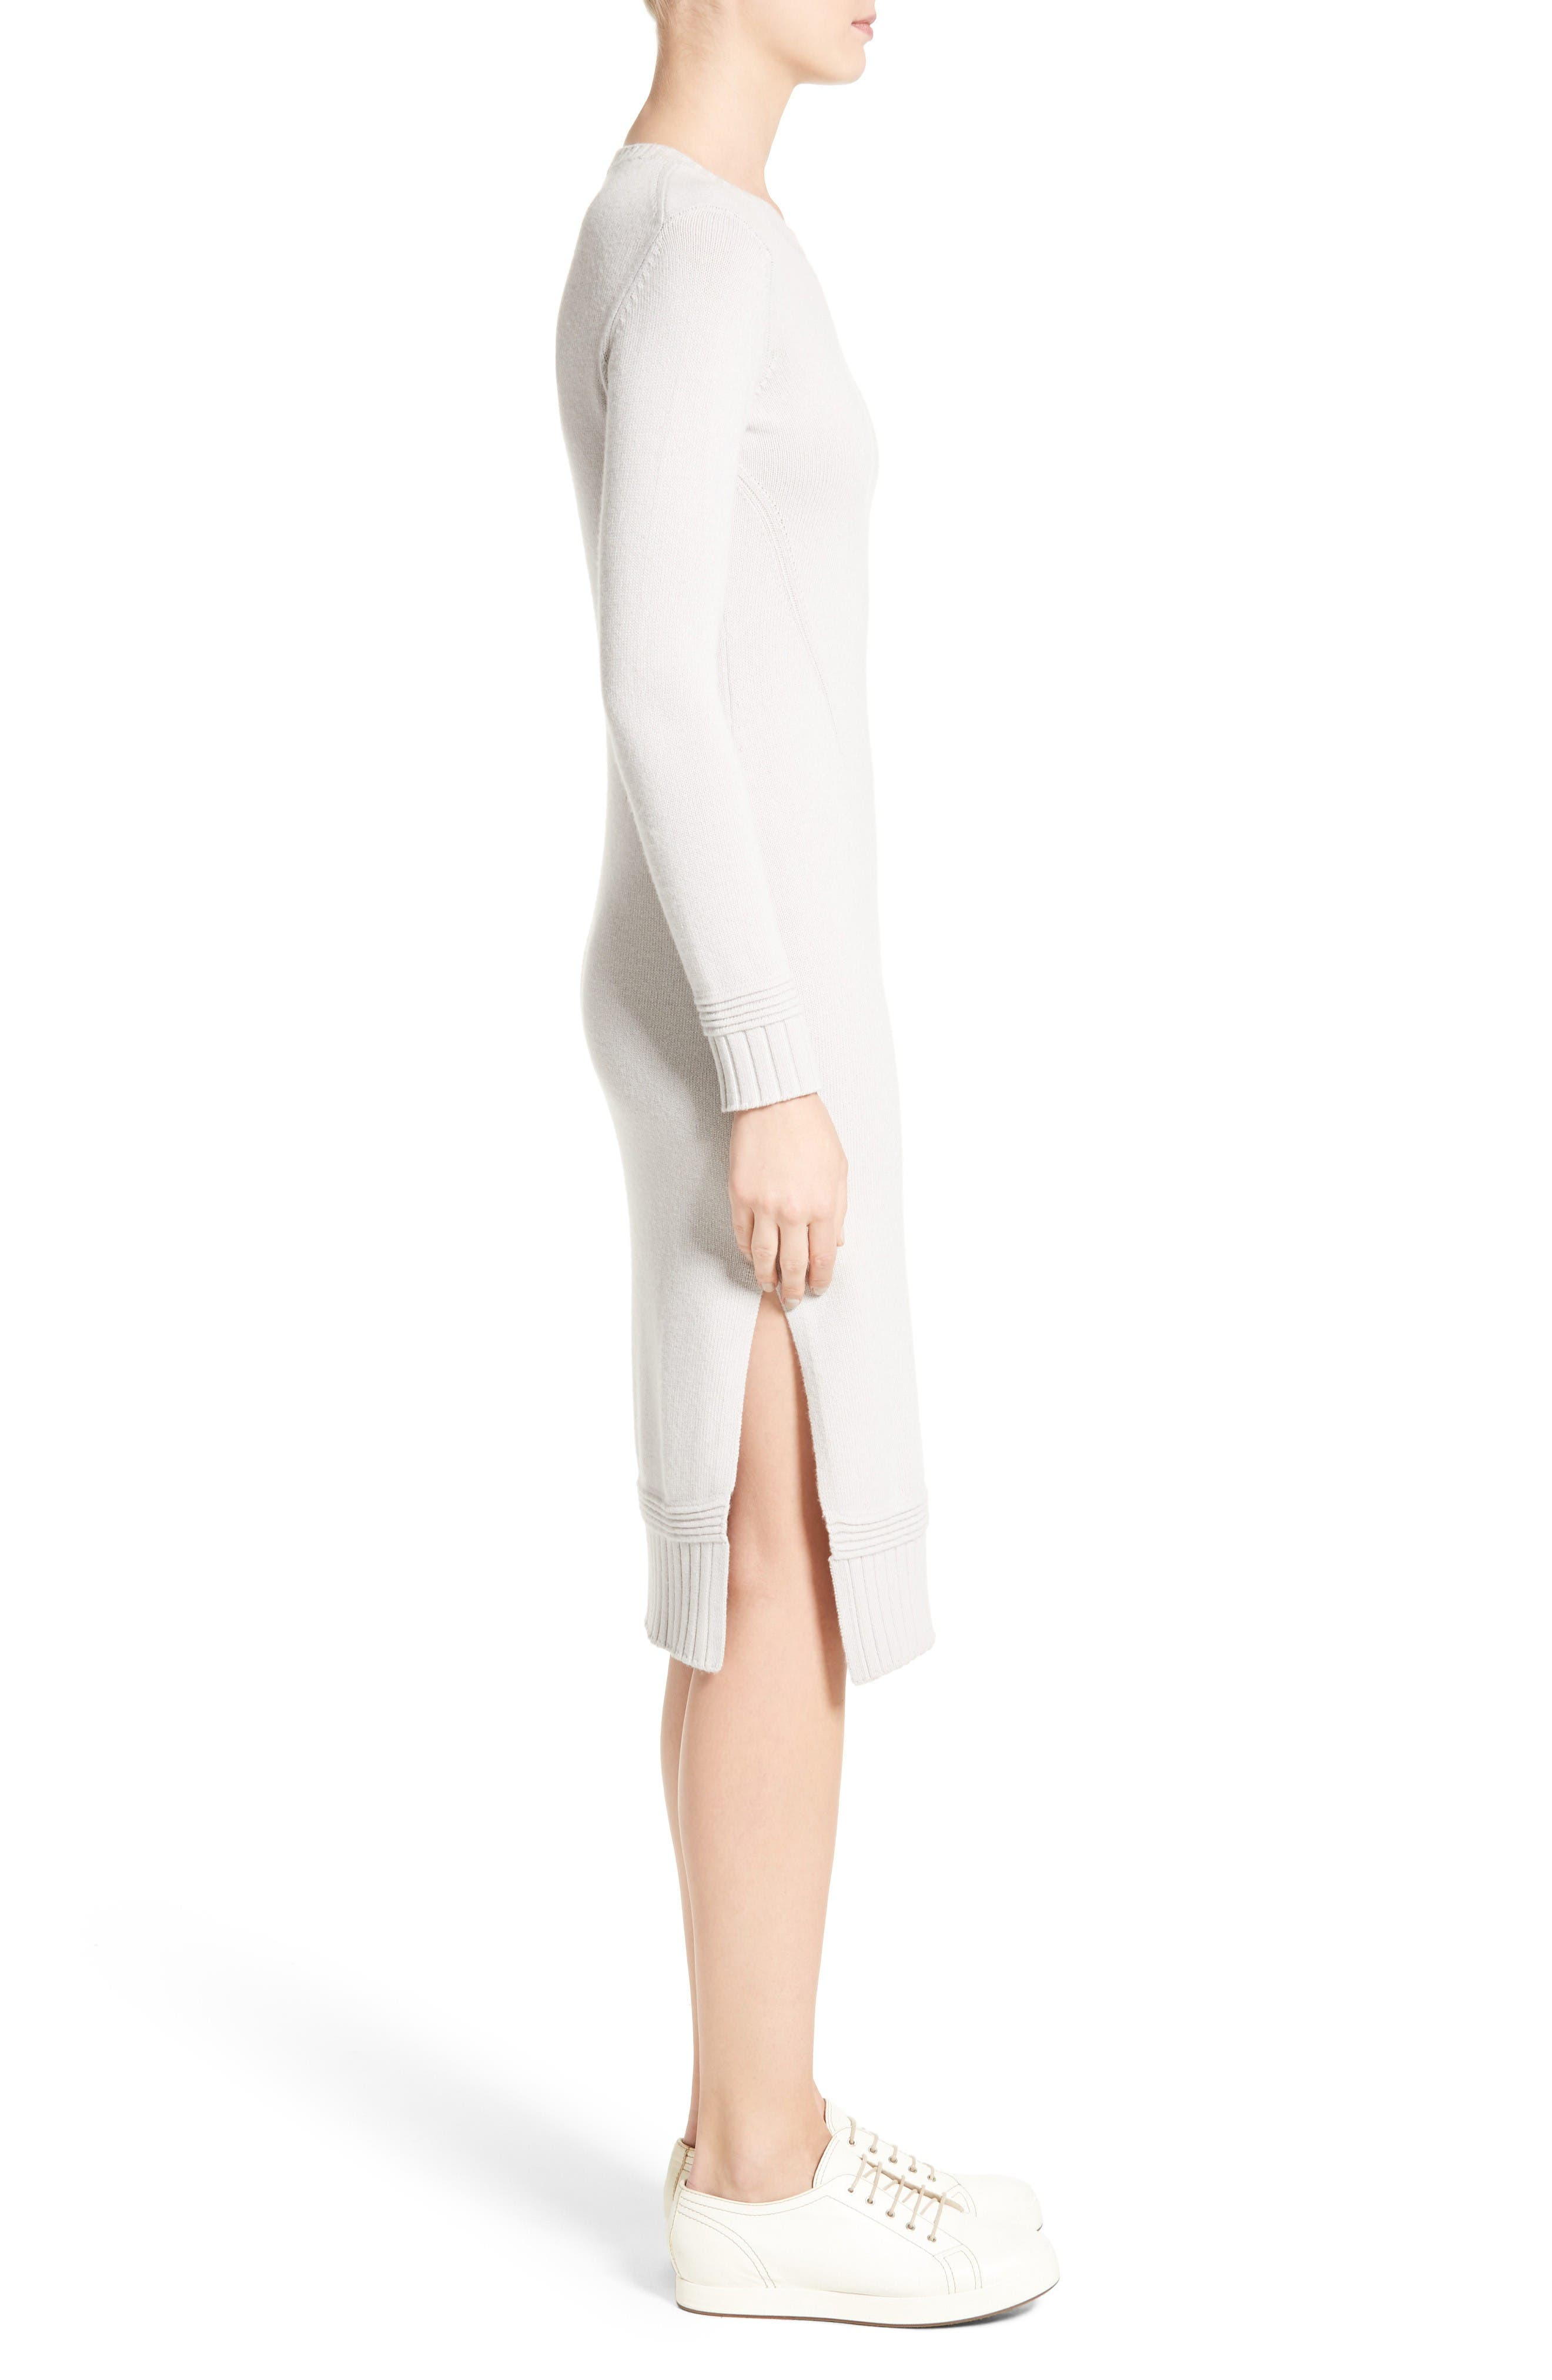 Armani Jeans Knit Sweater Dress,                             Alternate thumbnail 3, color,                             Light Grey